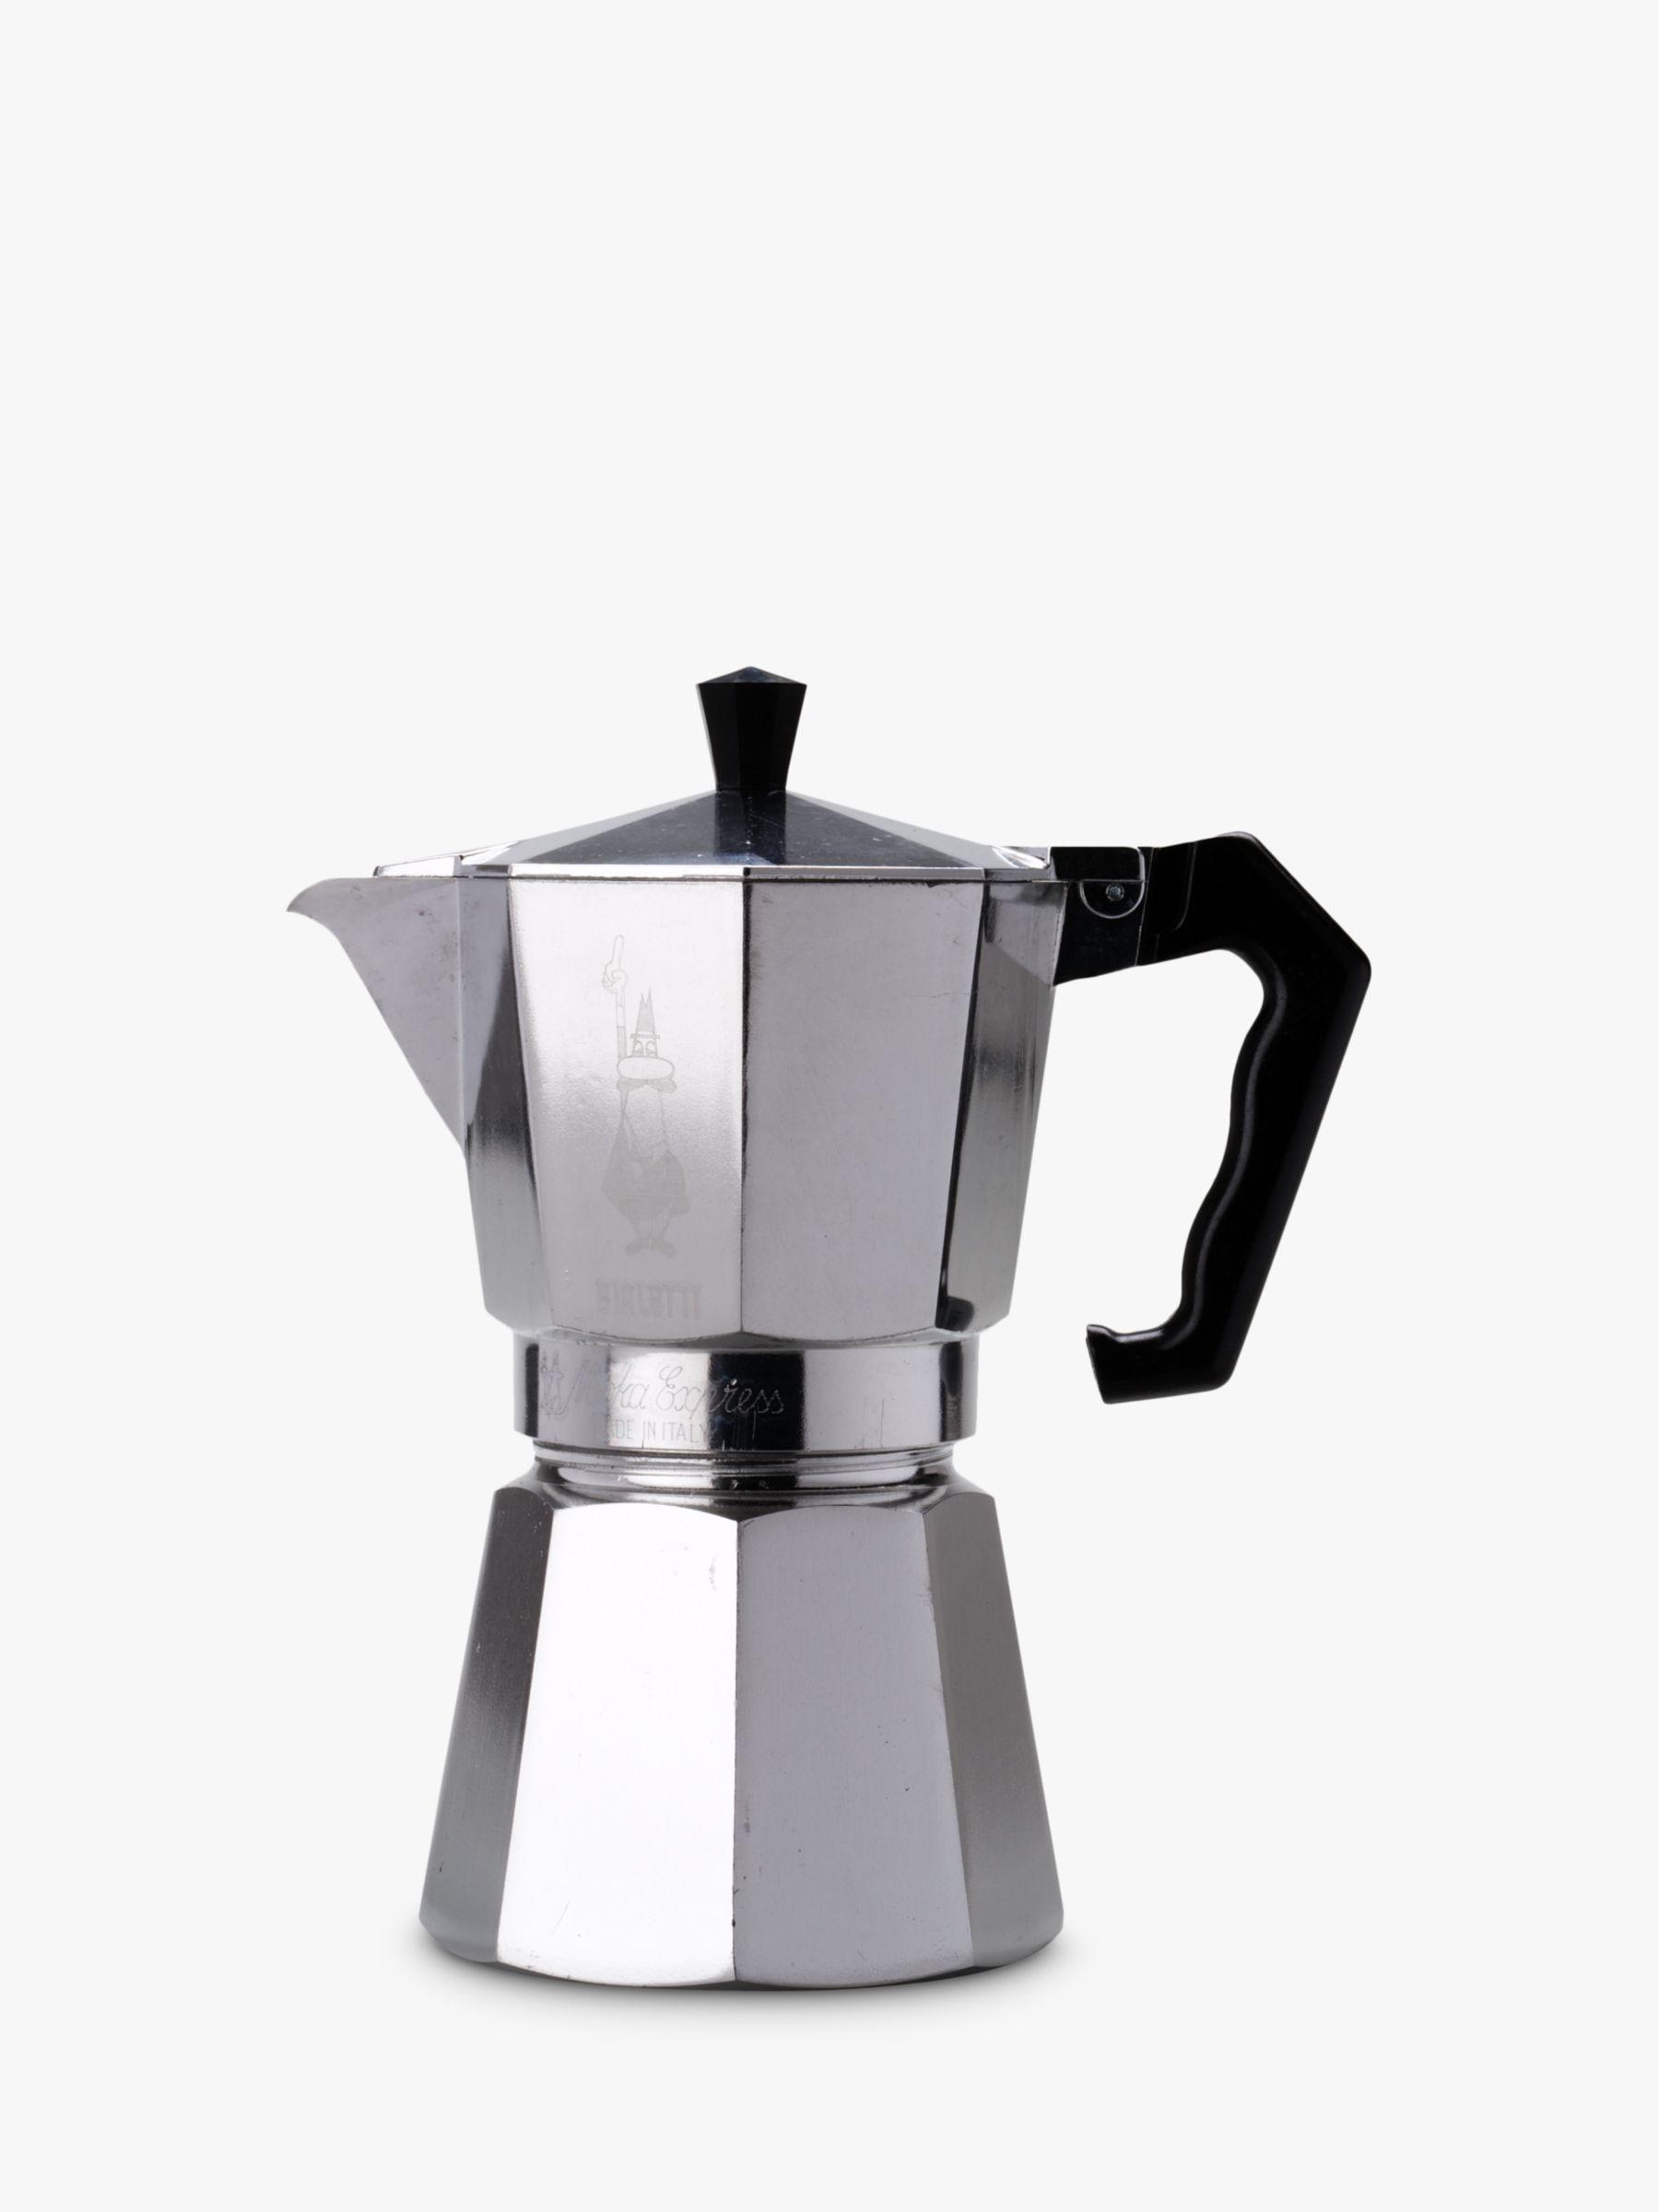 Bialetti Moka Express Hob Espresso